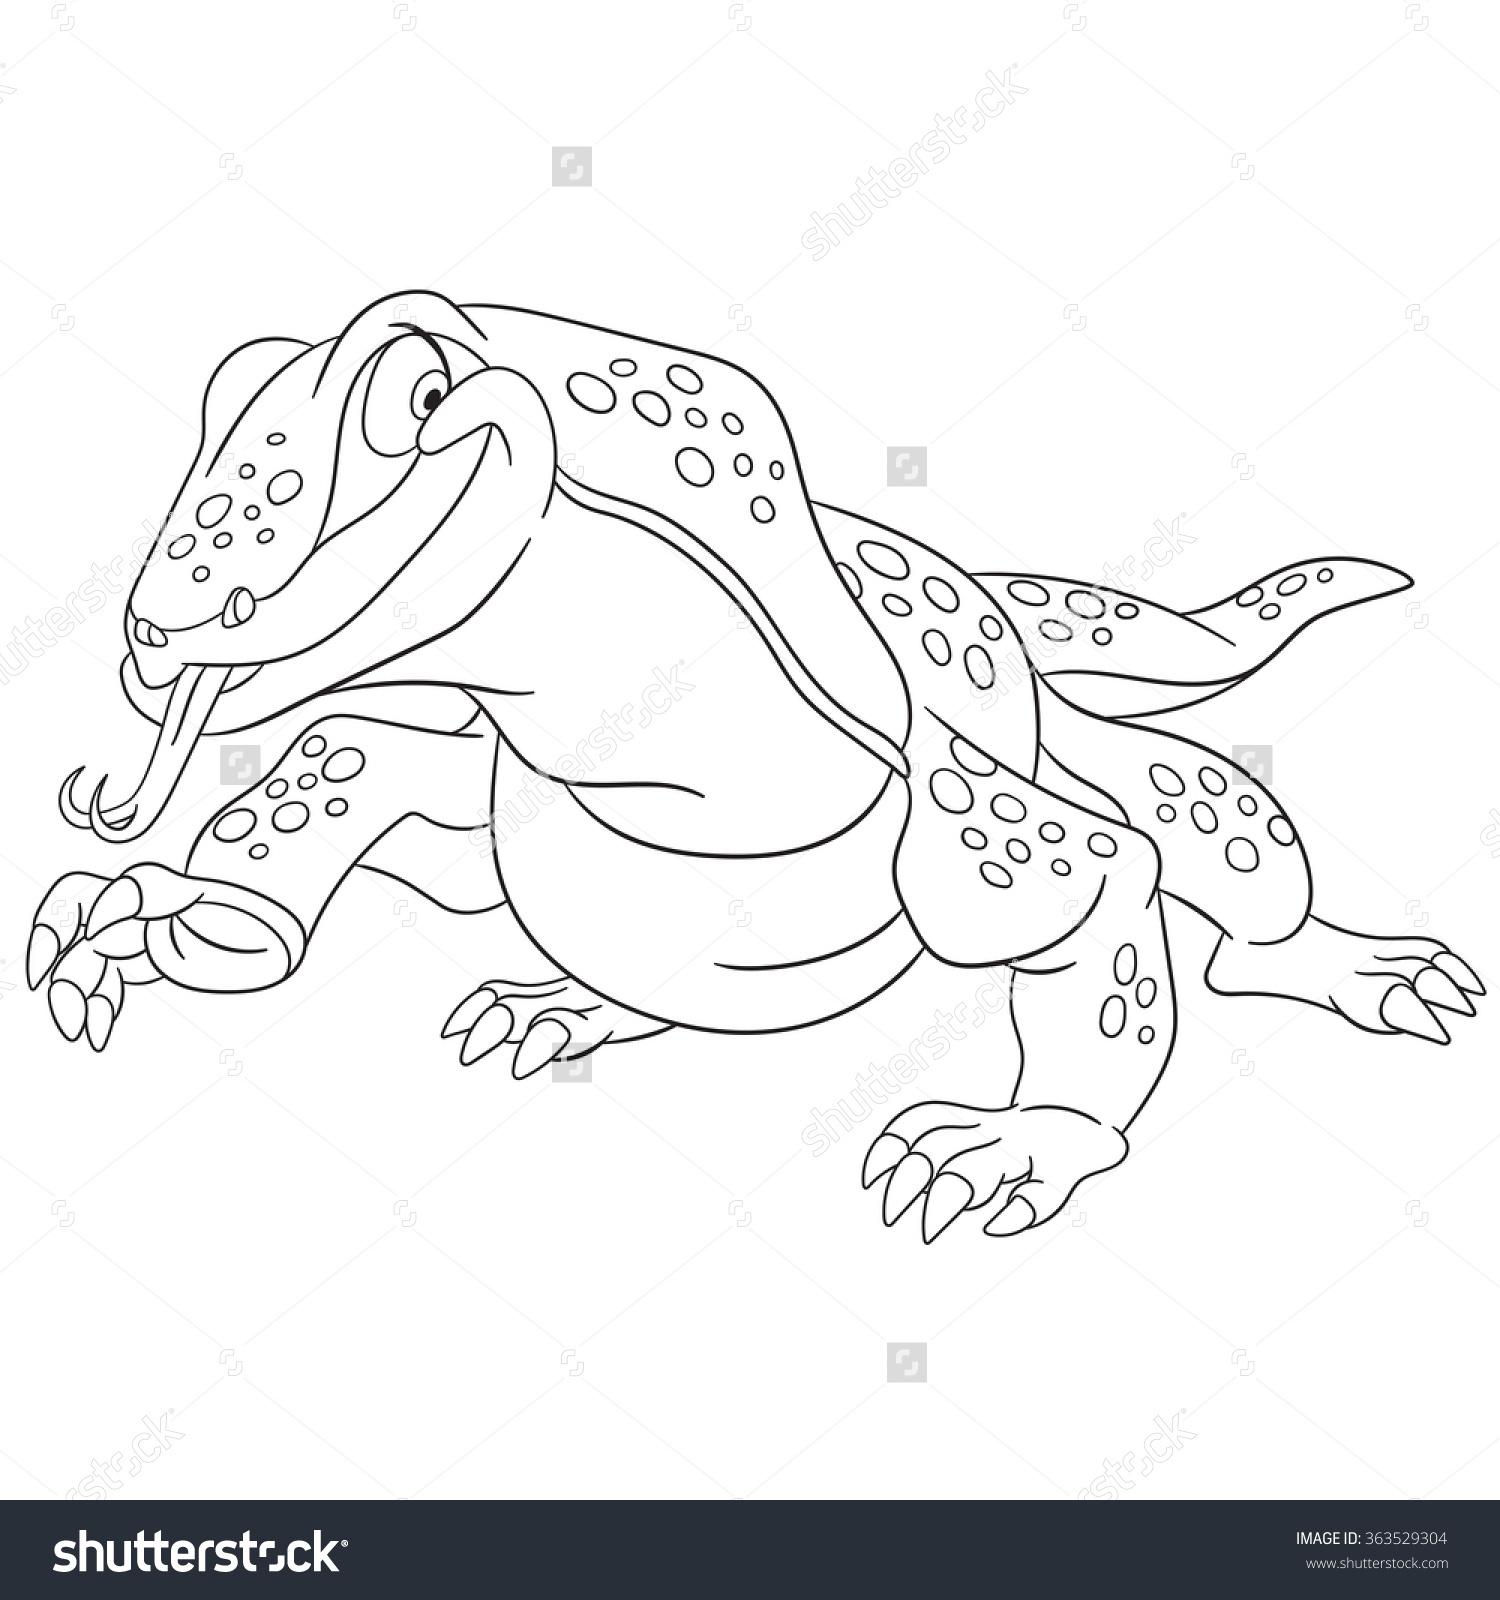 Cute Happy Cartoon Varan Komodo Dragon Stock Vector 363529304.